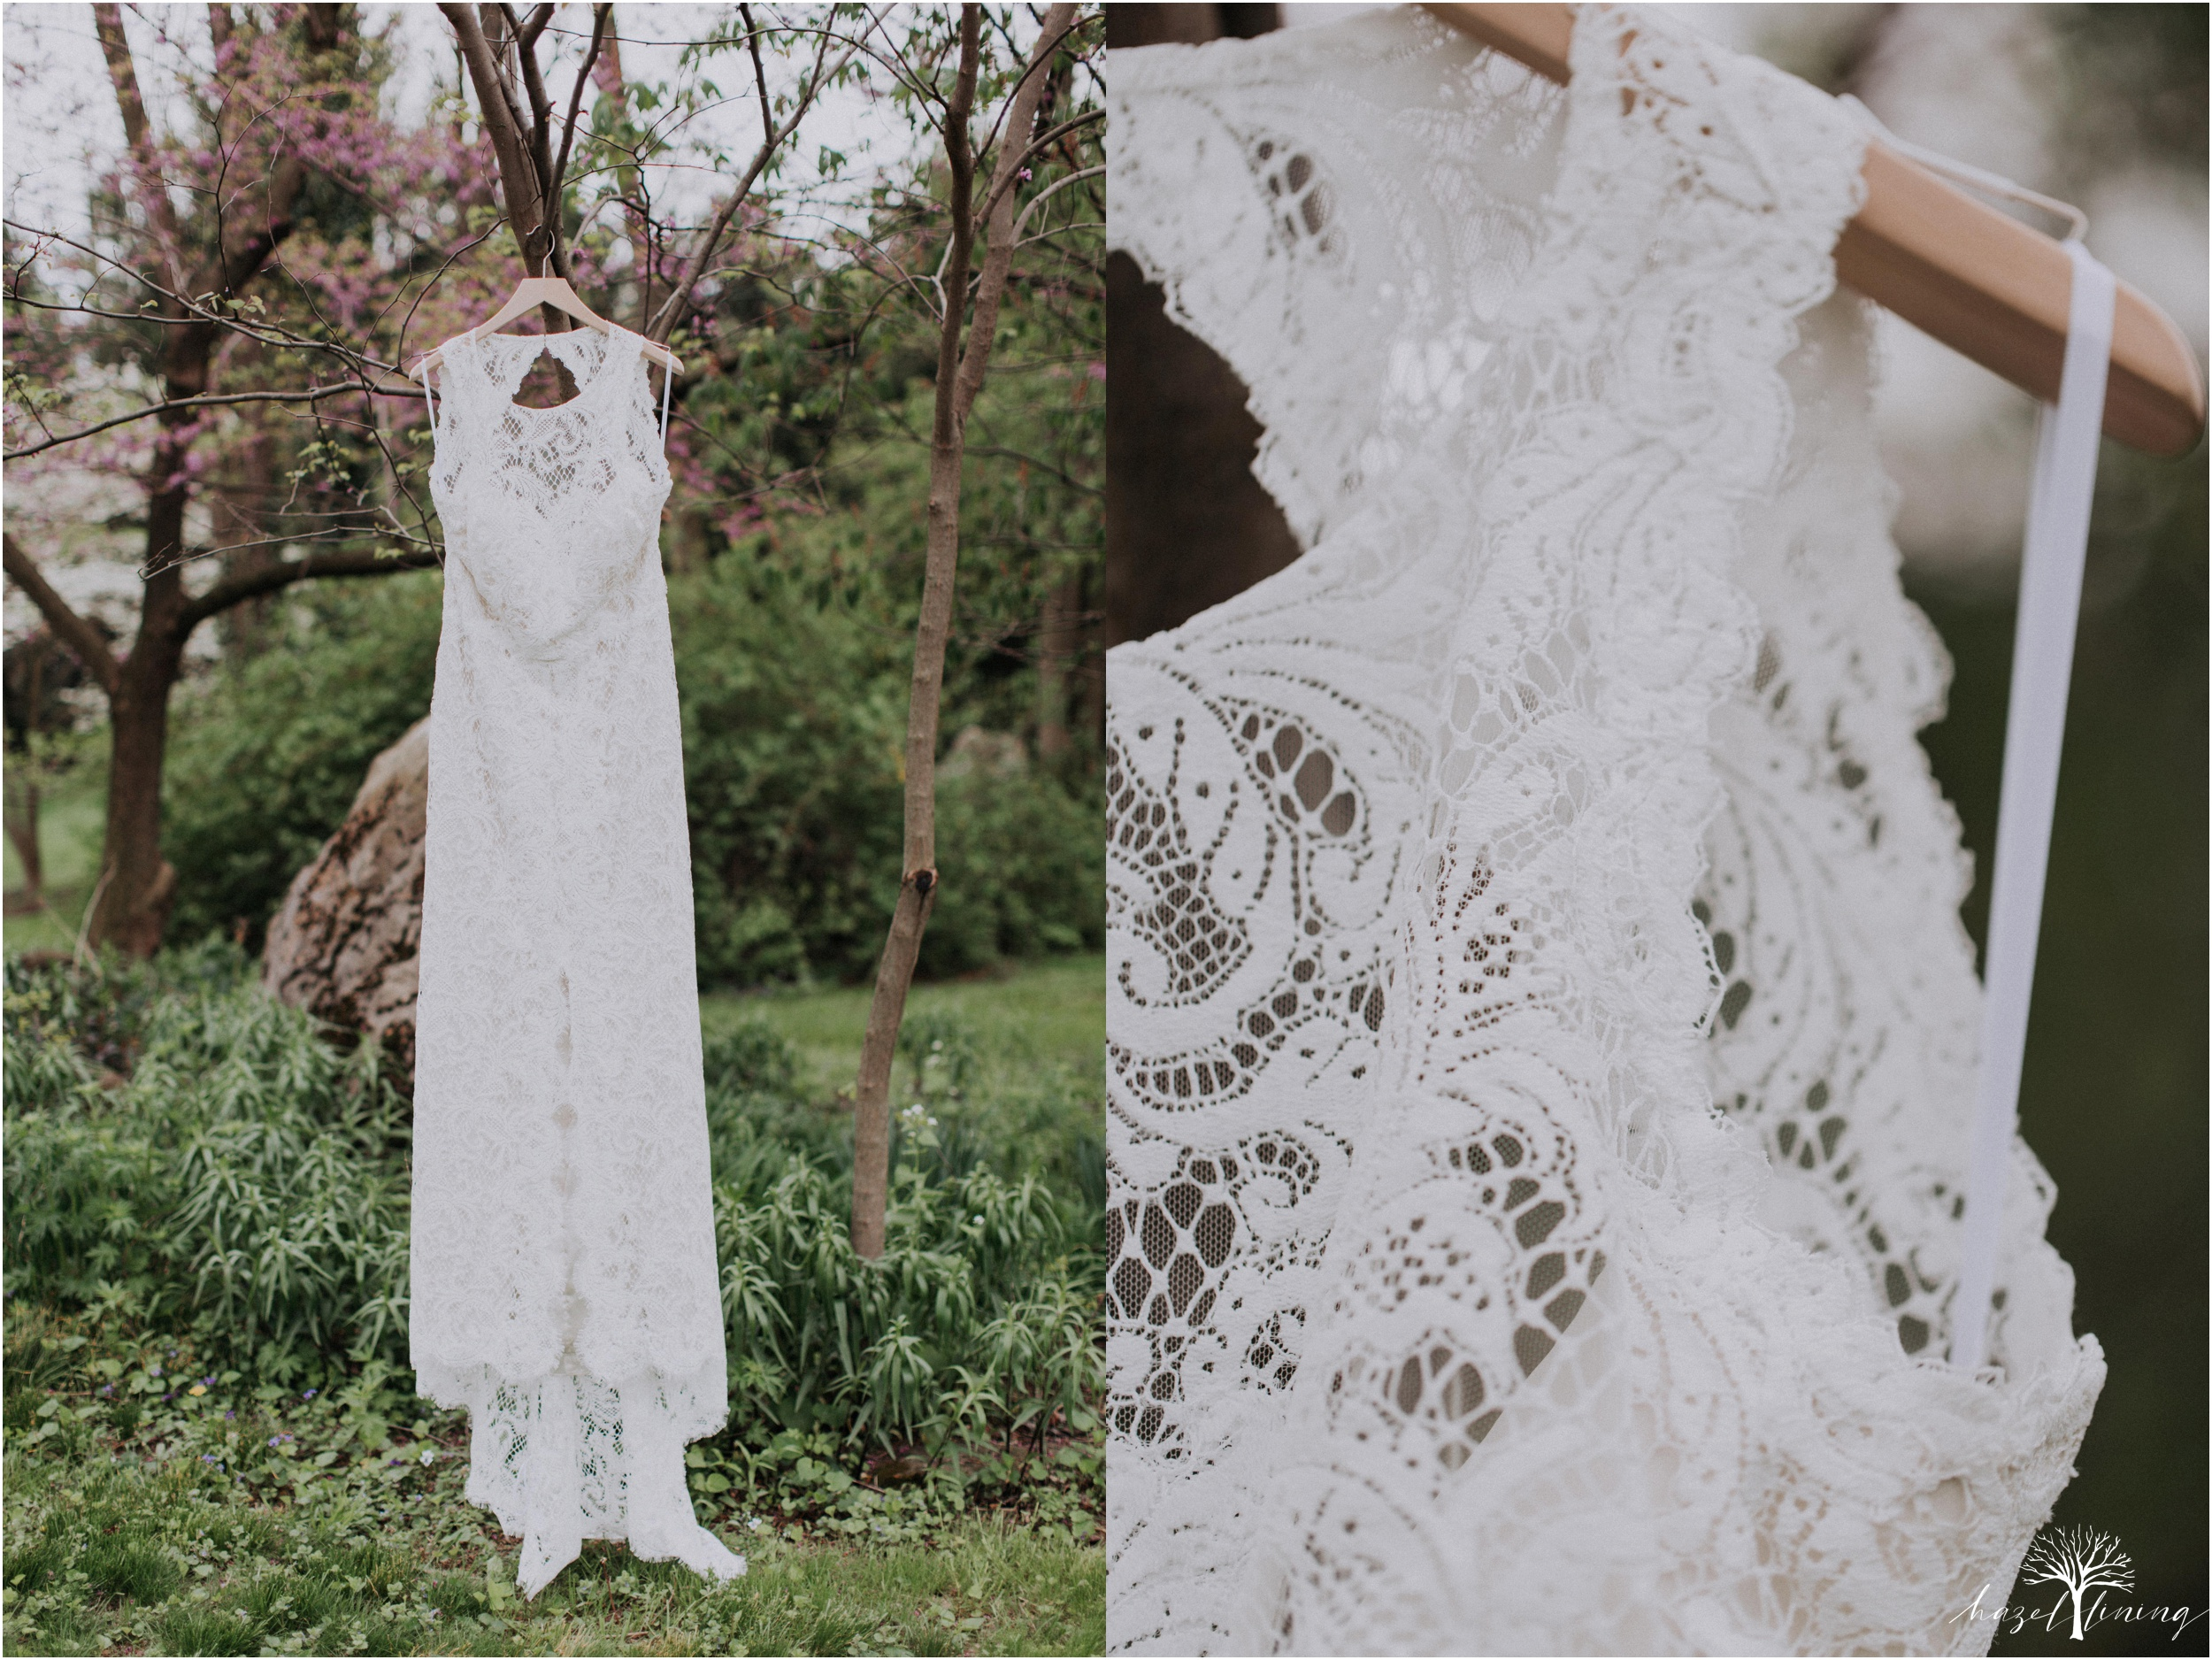 hazel-lining-travel-wedding-elopement-photography-abby-skyler-hunt-the-willis-house-york-pennsylvania-outdoor-estate-wedding_0005.jpg